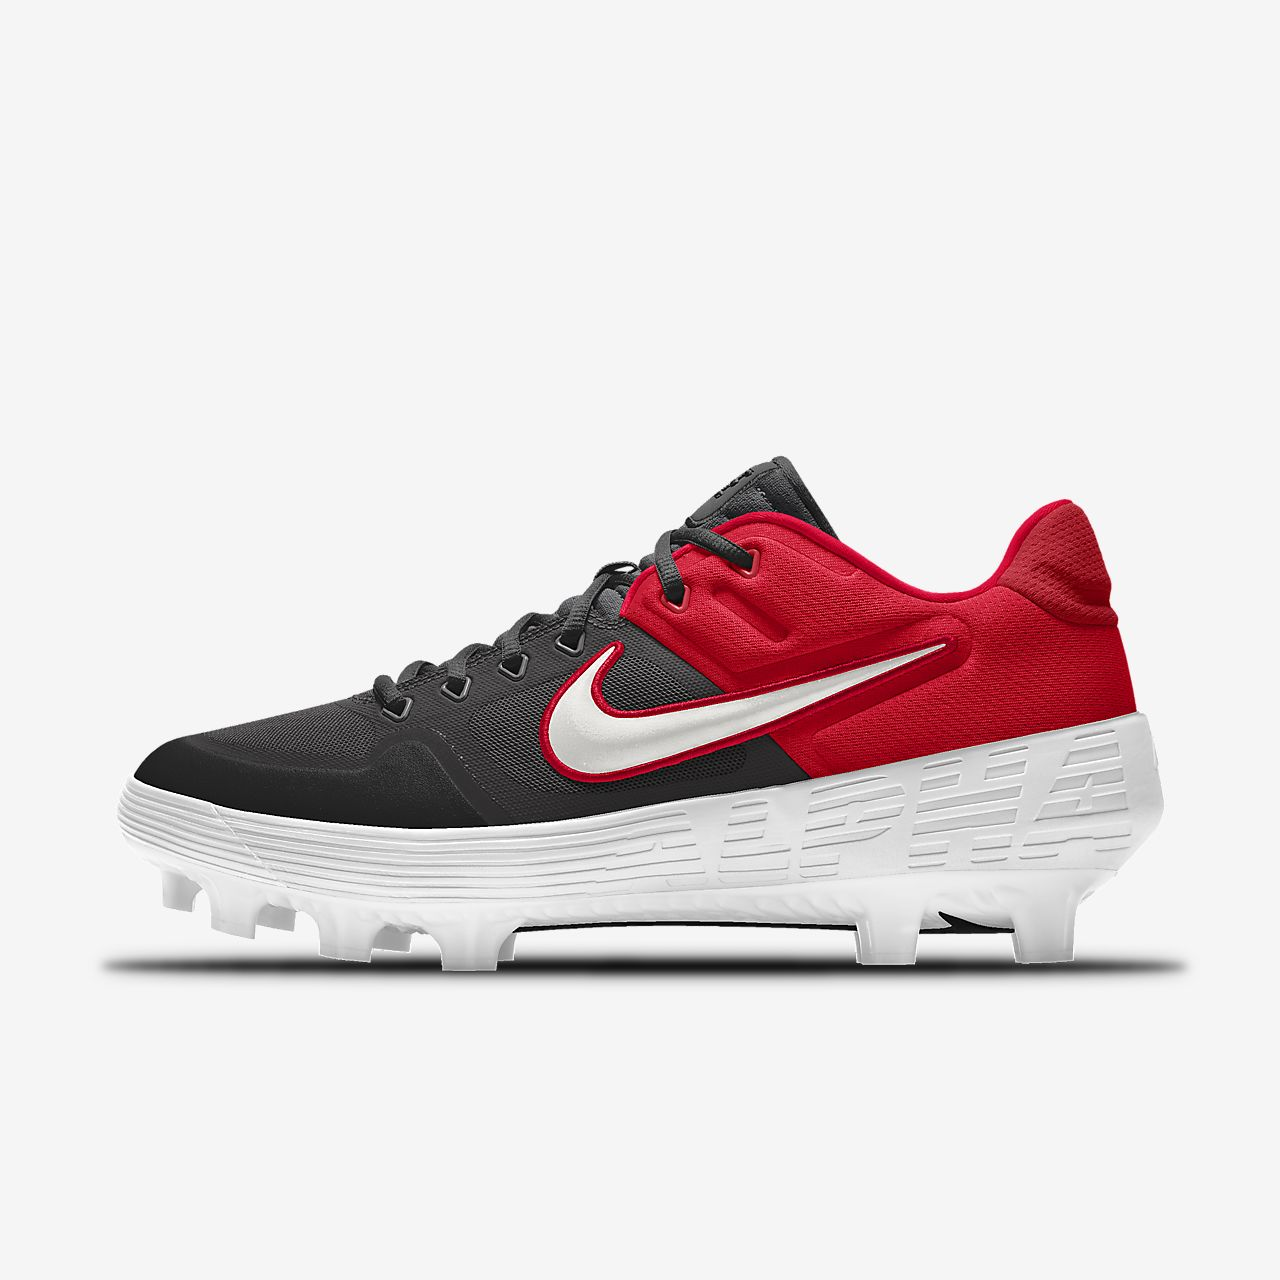 Chaussure de baseball à crampons personnalisable Nike Alpha Huarache Elite 2 Low MCS By You